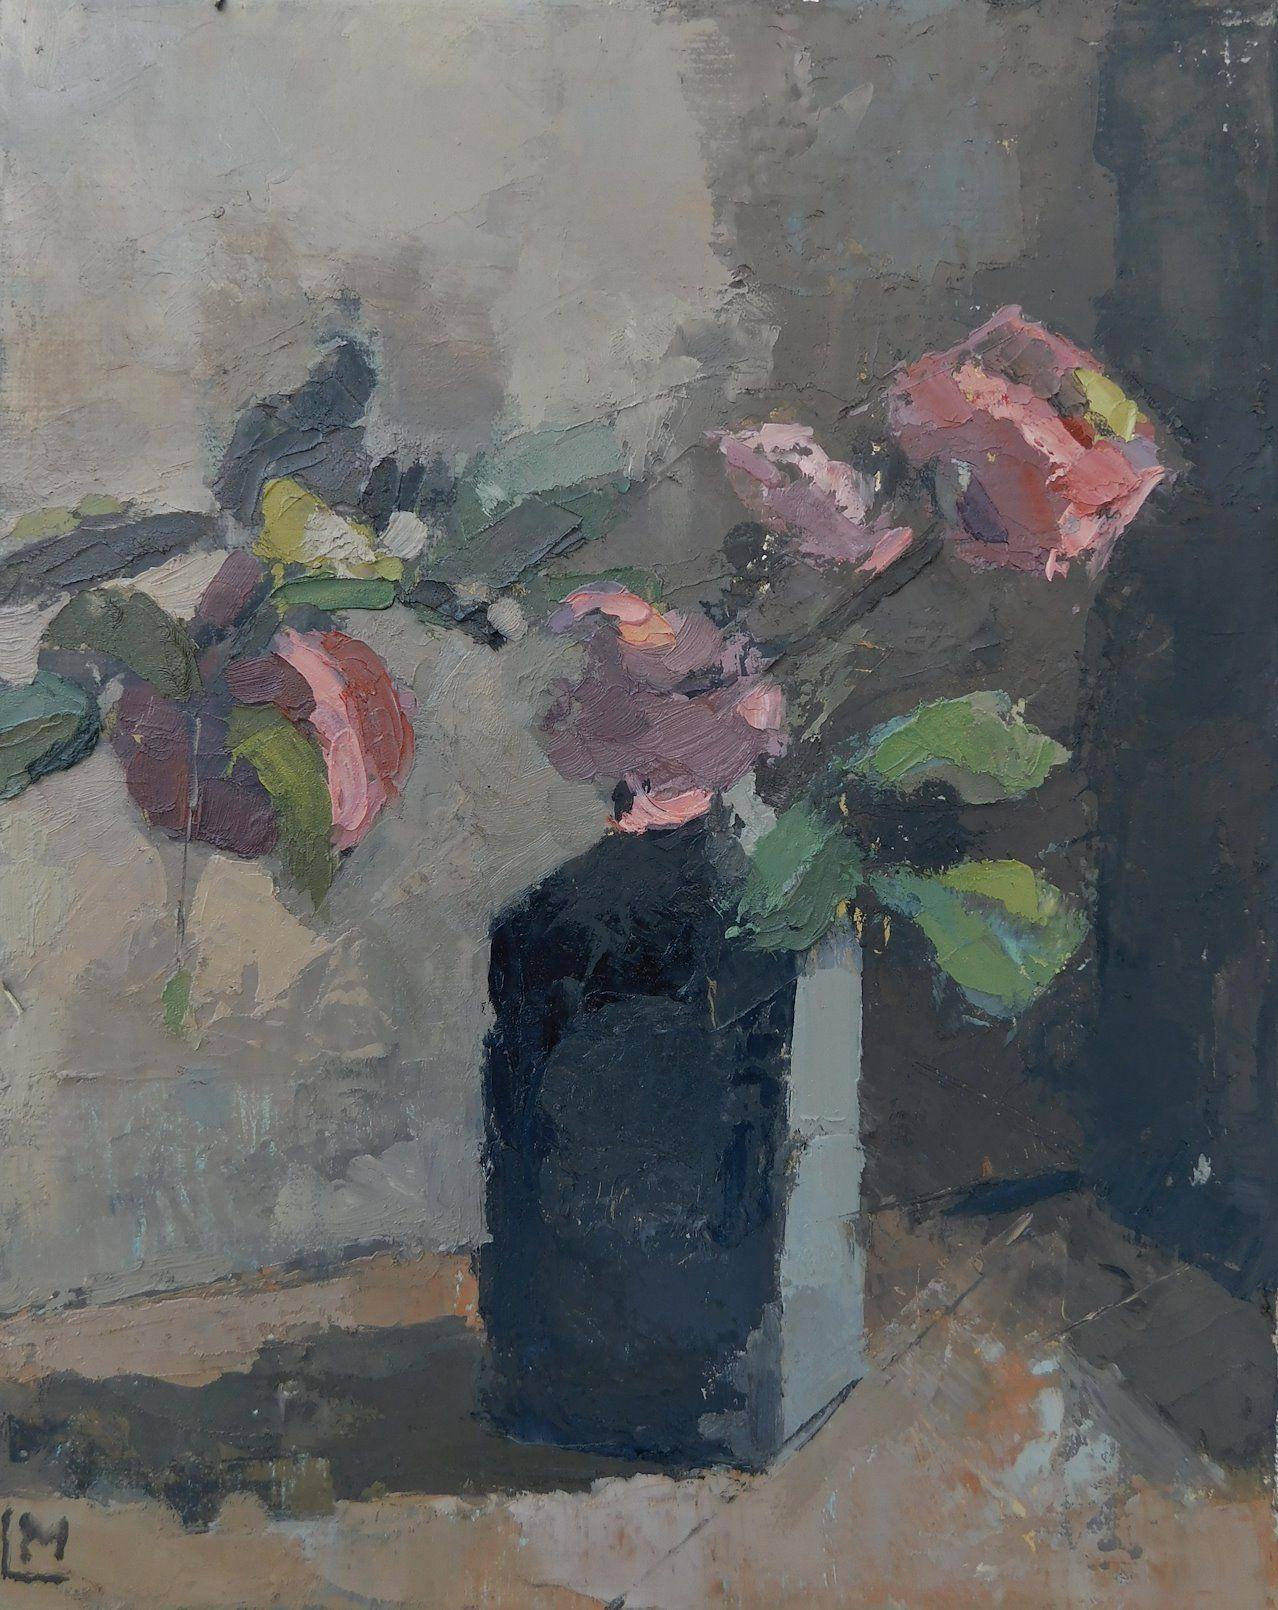 recent paintings nel 2020 | Dipingere idee, Pittura di ...